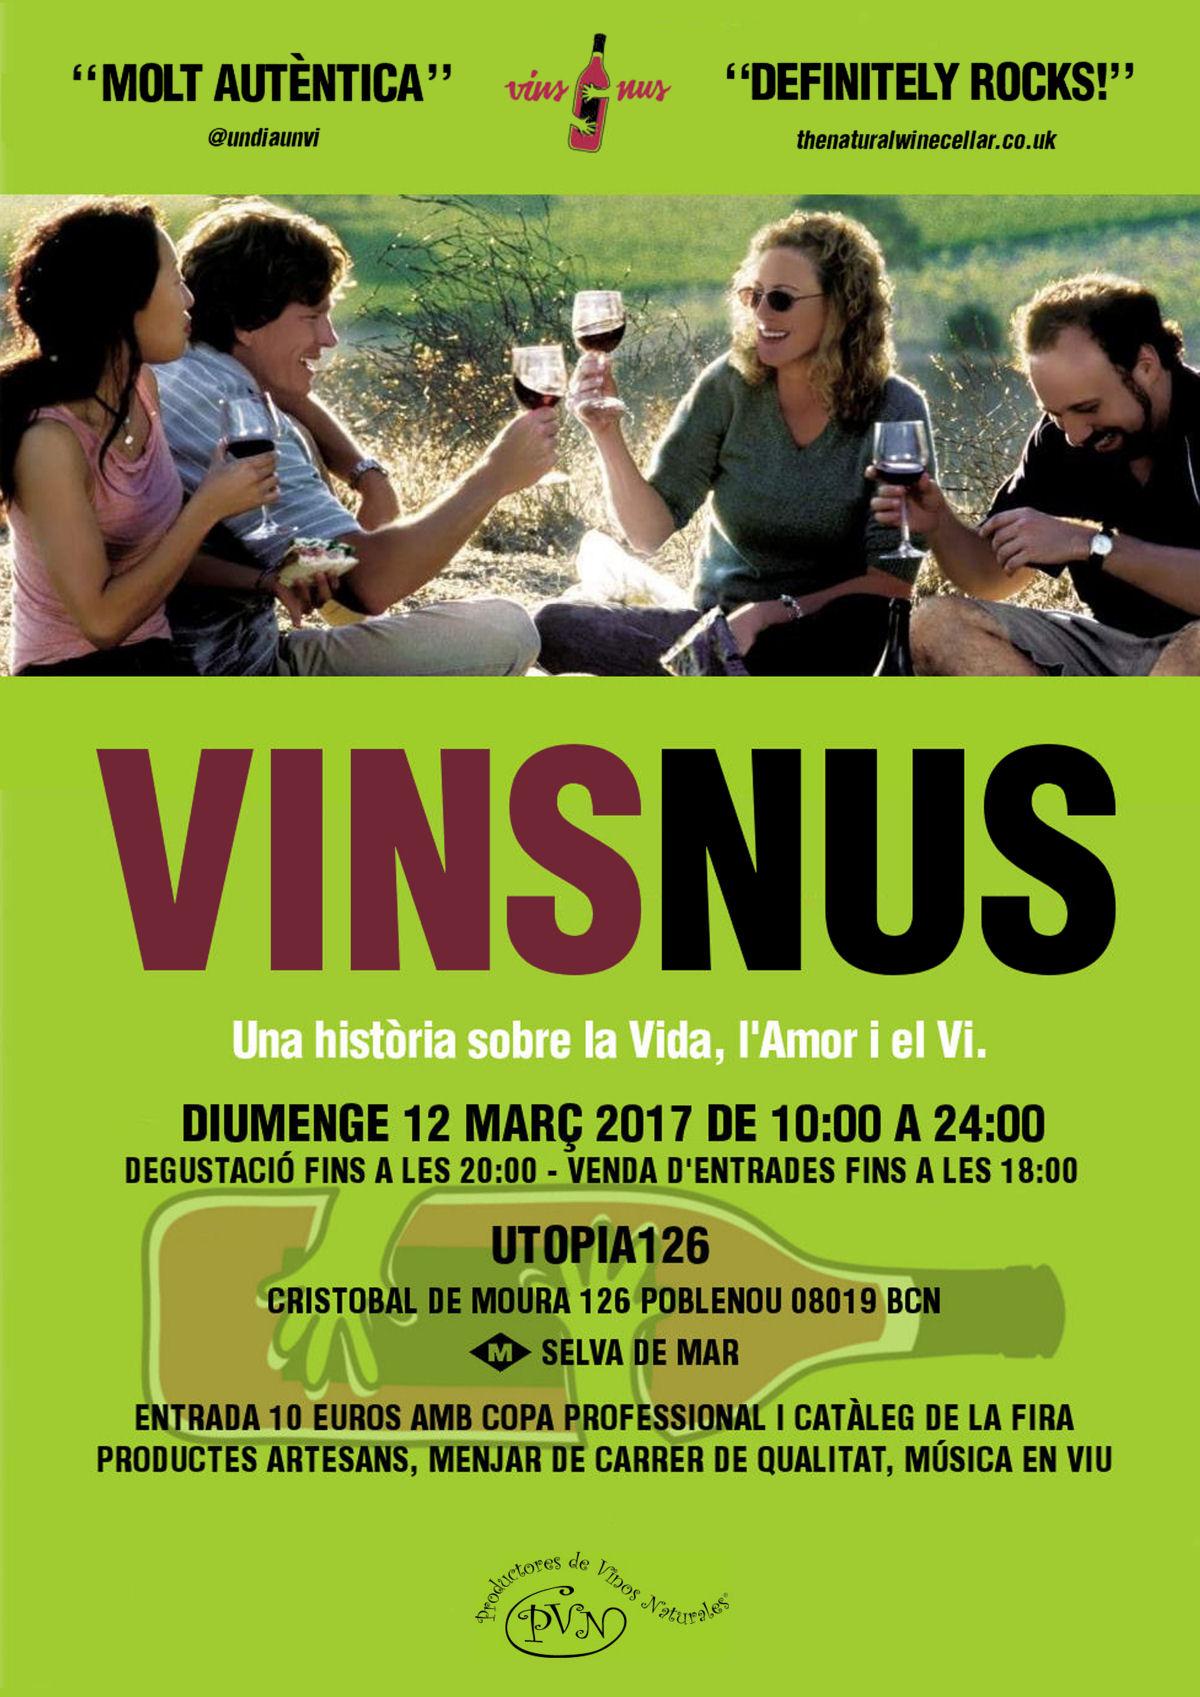 vins_nus_2017_1200